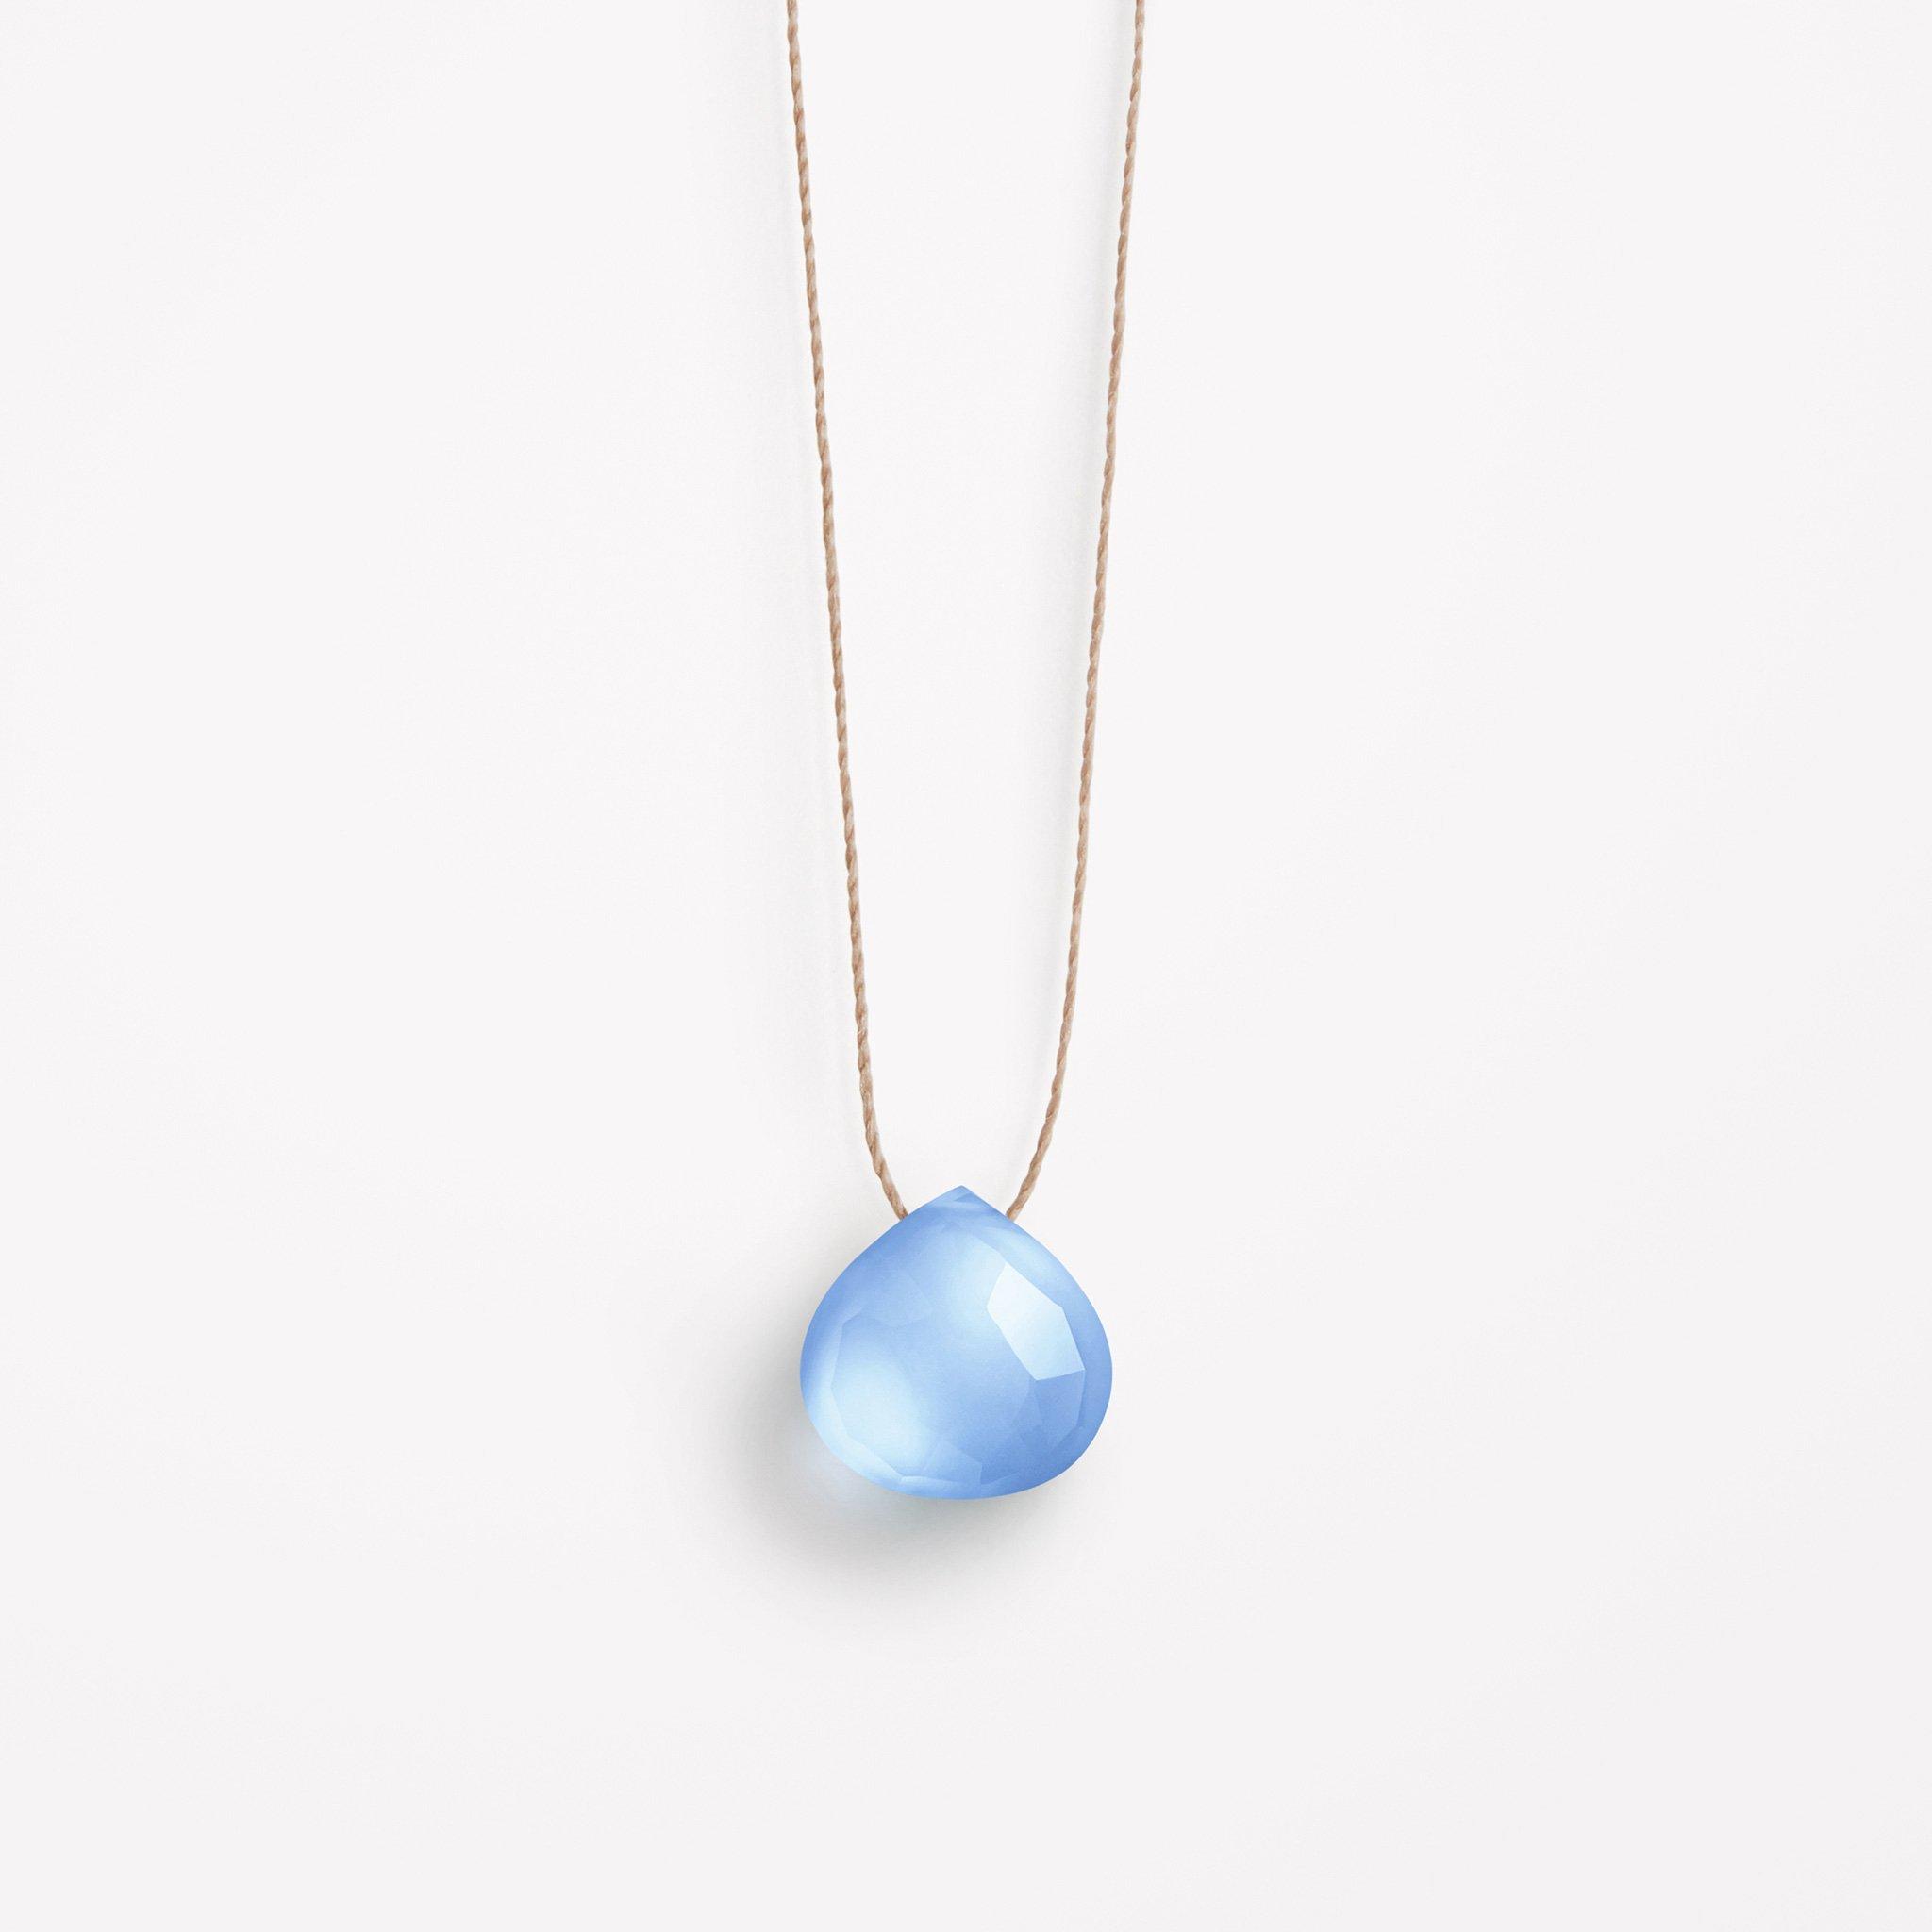 Cornflower Blue Chalcedony Necklace